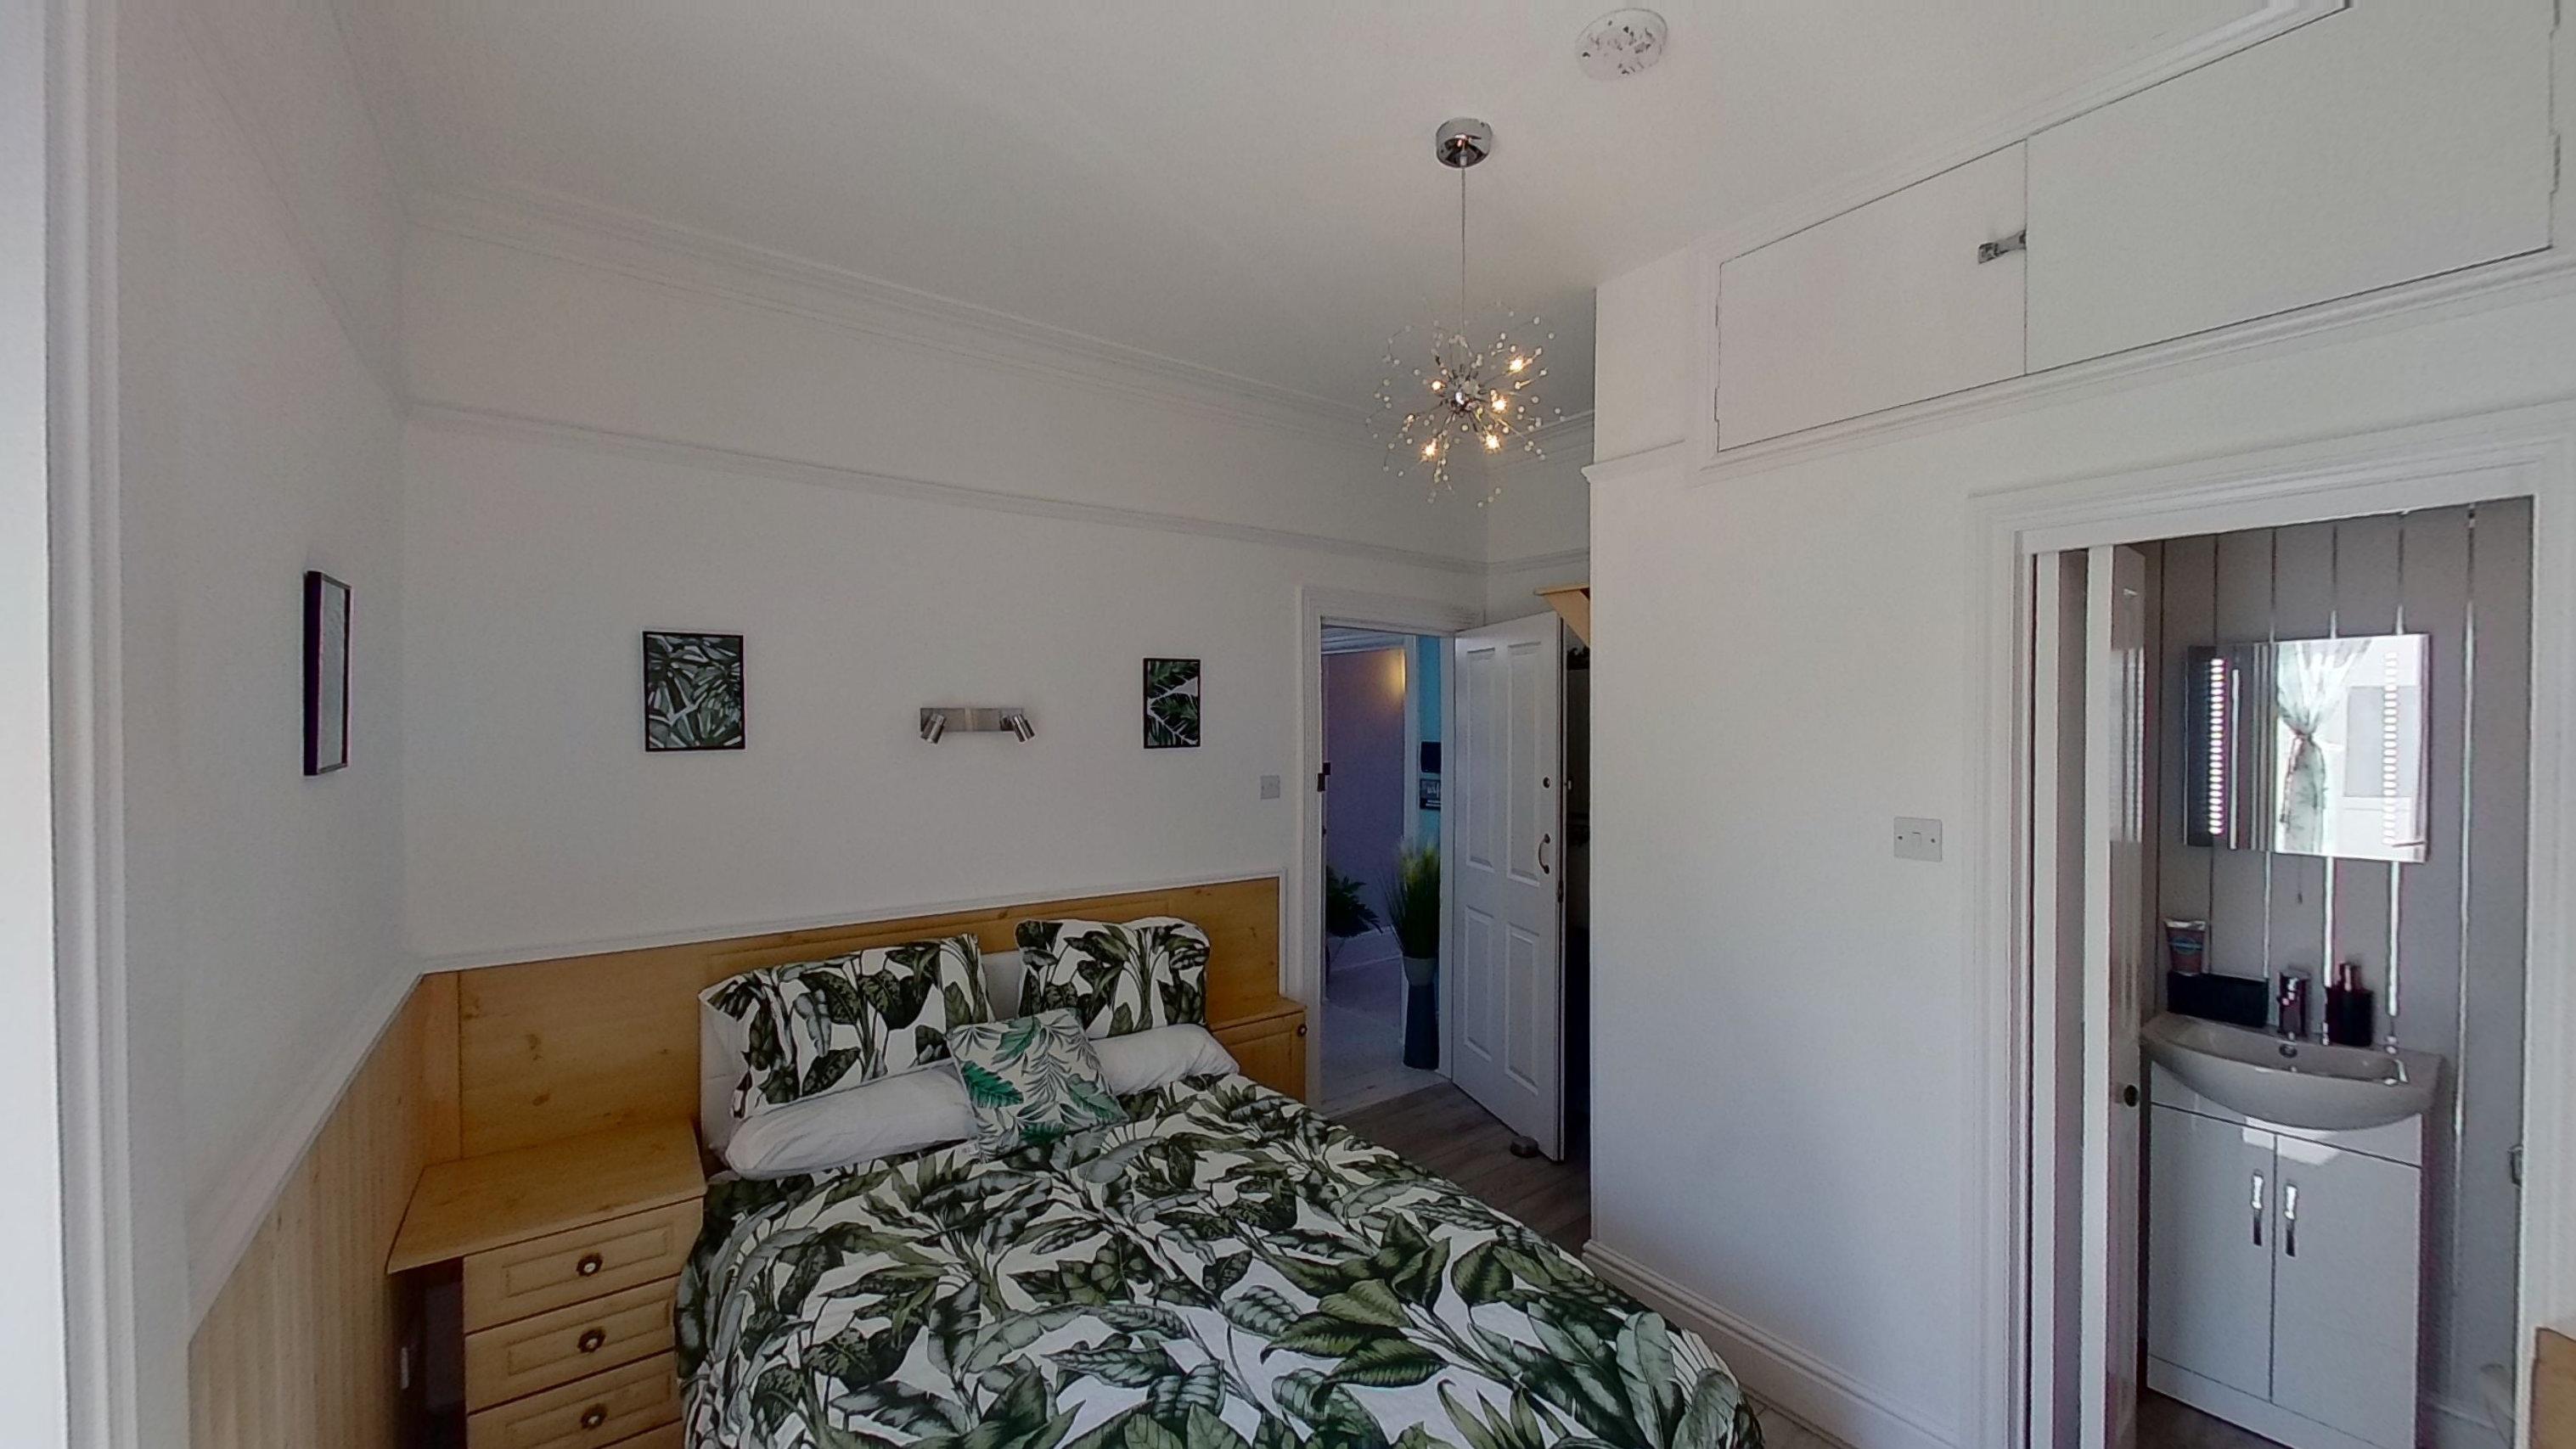 Beachcomber Holiday Lodge 07192021 051352